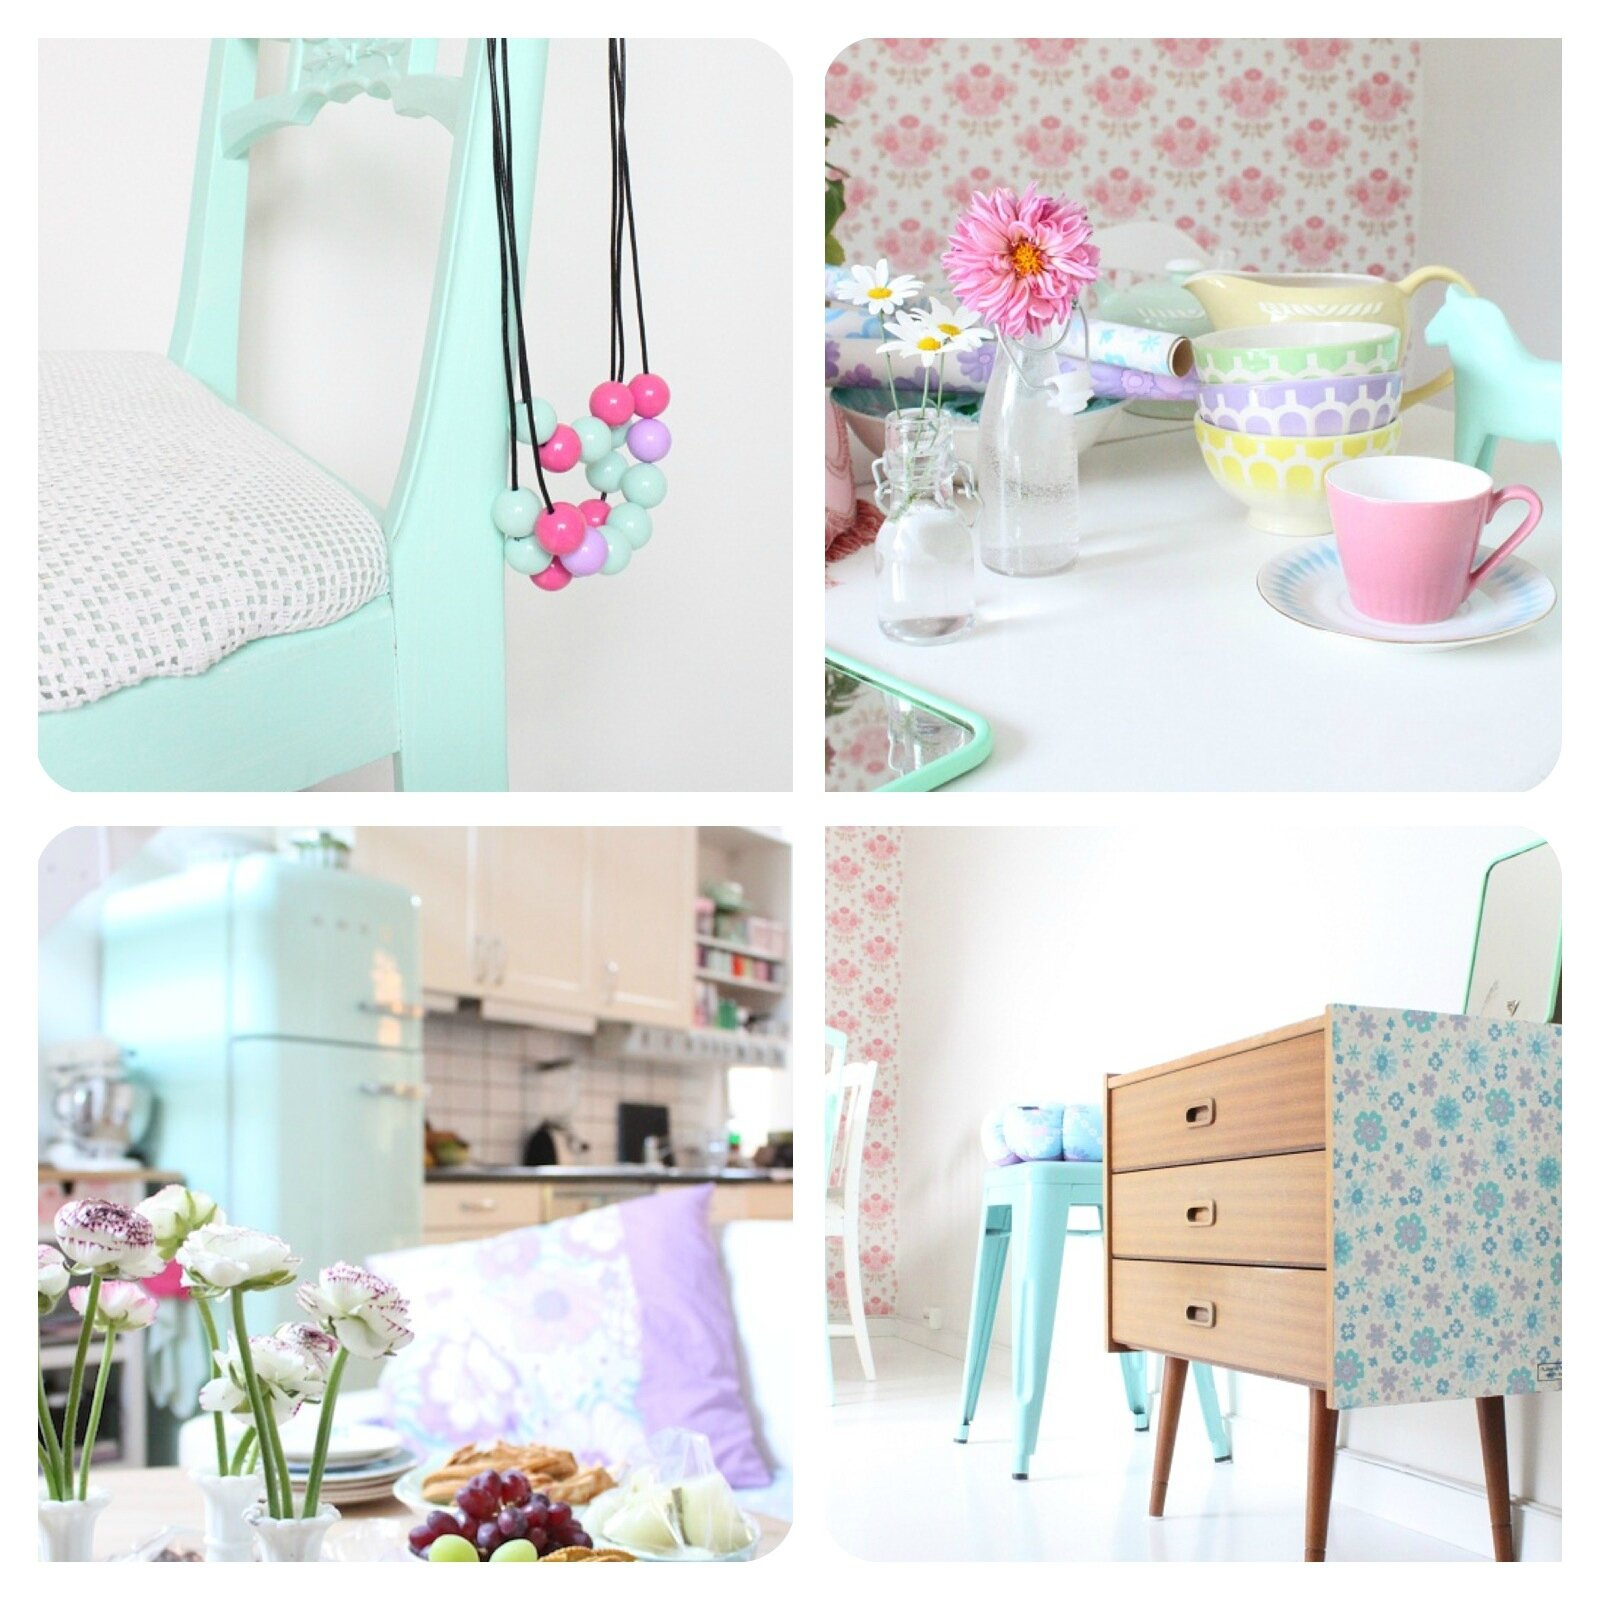 deco pastel vintage ustensiles de cuisine. Black Bedroom Furniture Sets. Home Design Ideas